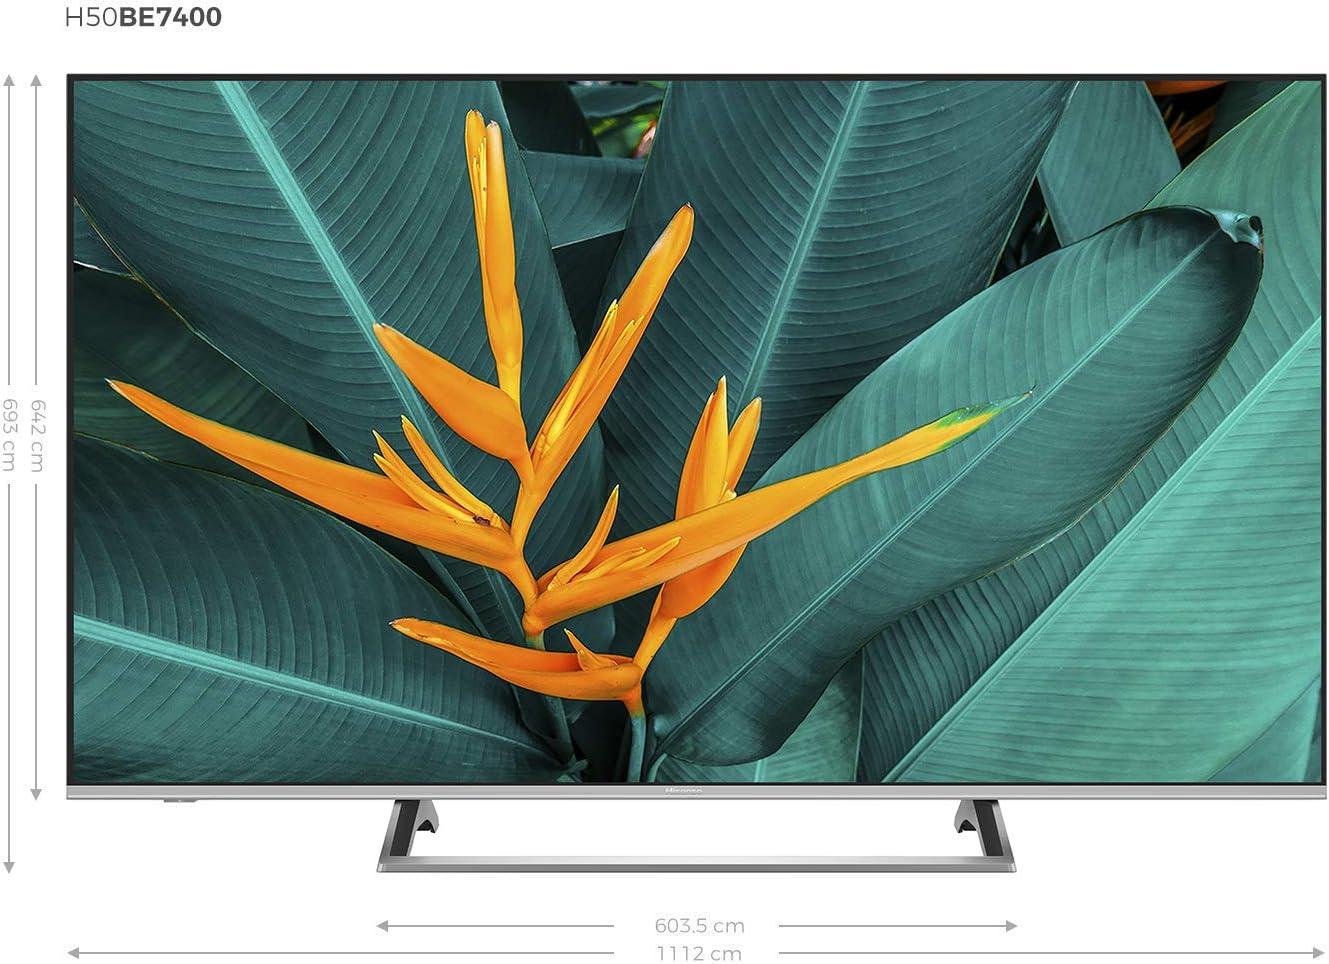 2 USB salida /óptica Wifi Audio DTS Hisense H55BE7400 Smart TV ULED 55 4K Ultra HD Bluetooth Smart TV VIDAA U 3.0 con IA 3 HDMI Procesador Quad Core Dolby Vision HDR Wide Color Gamut